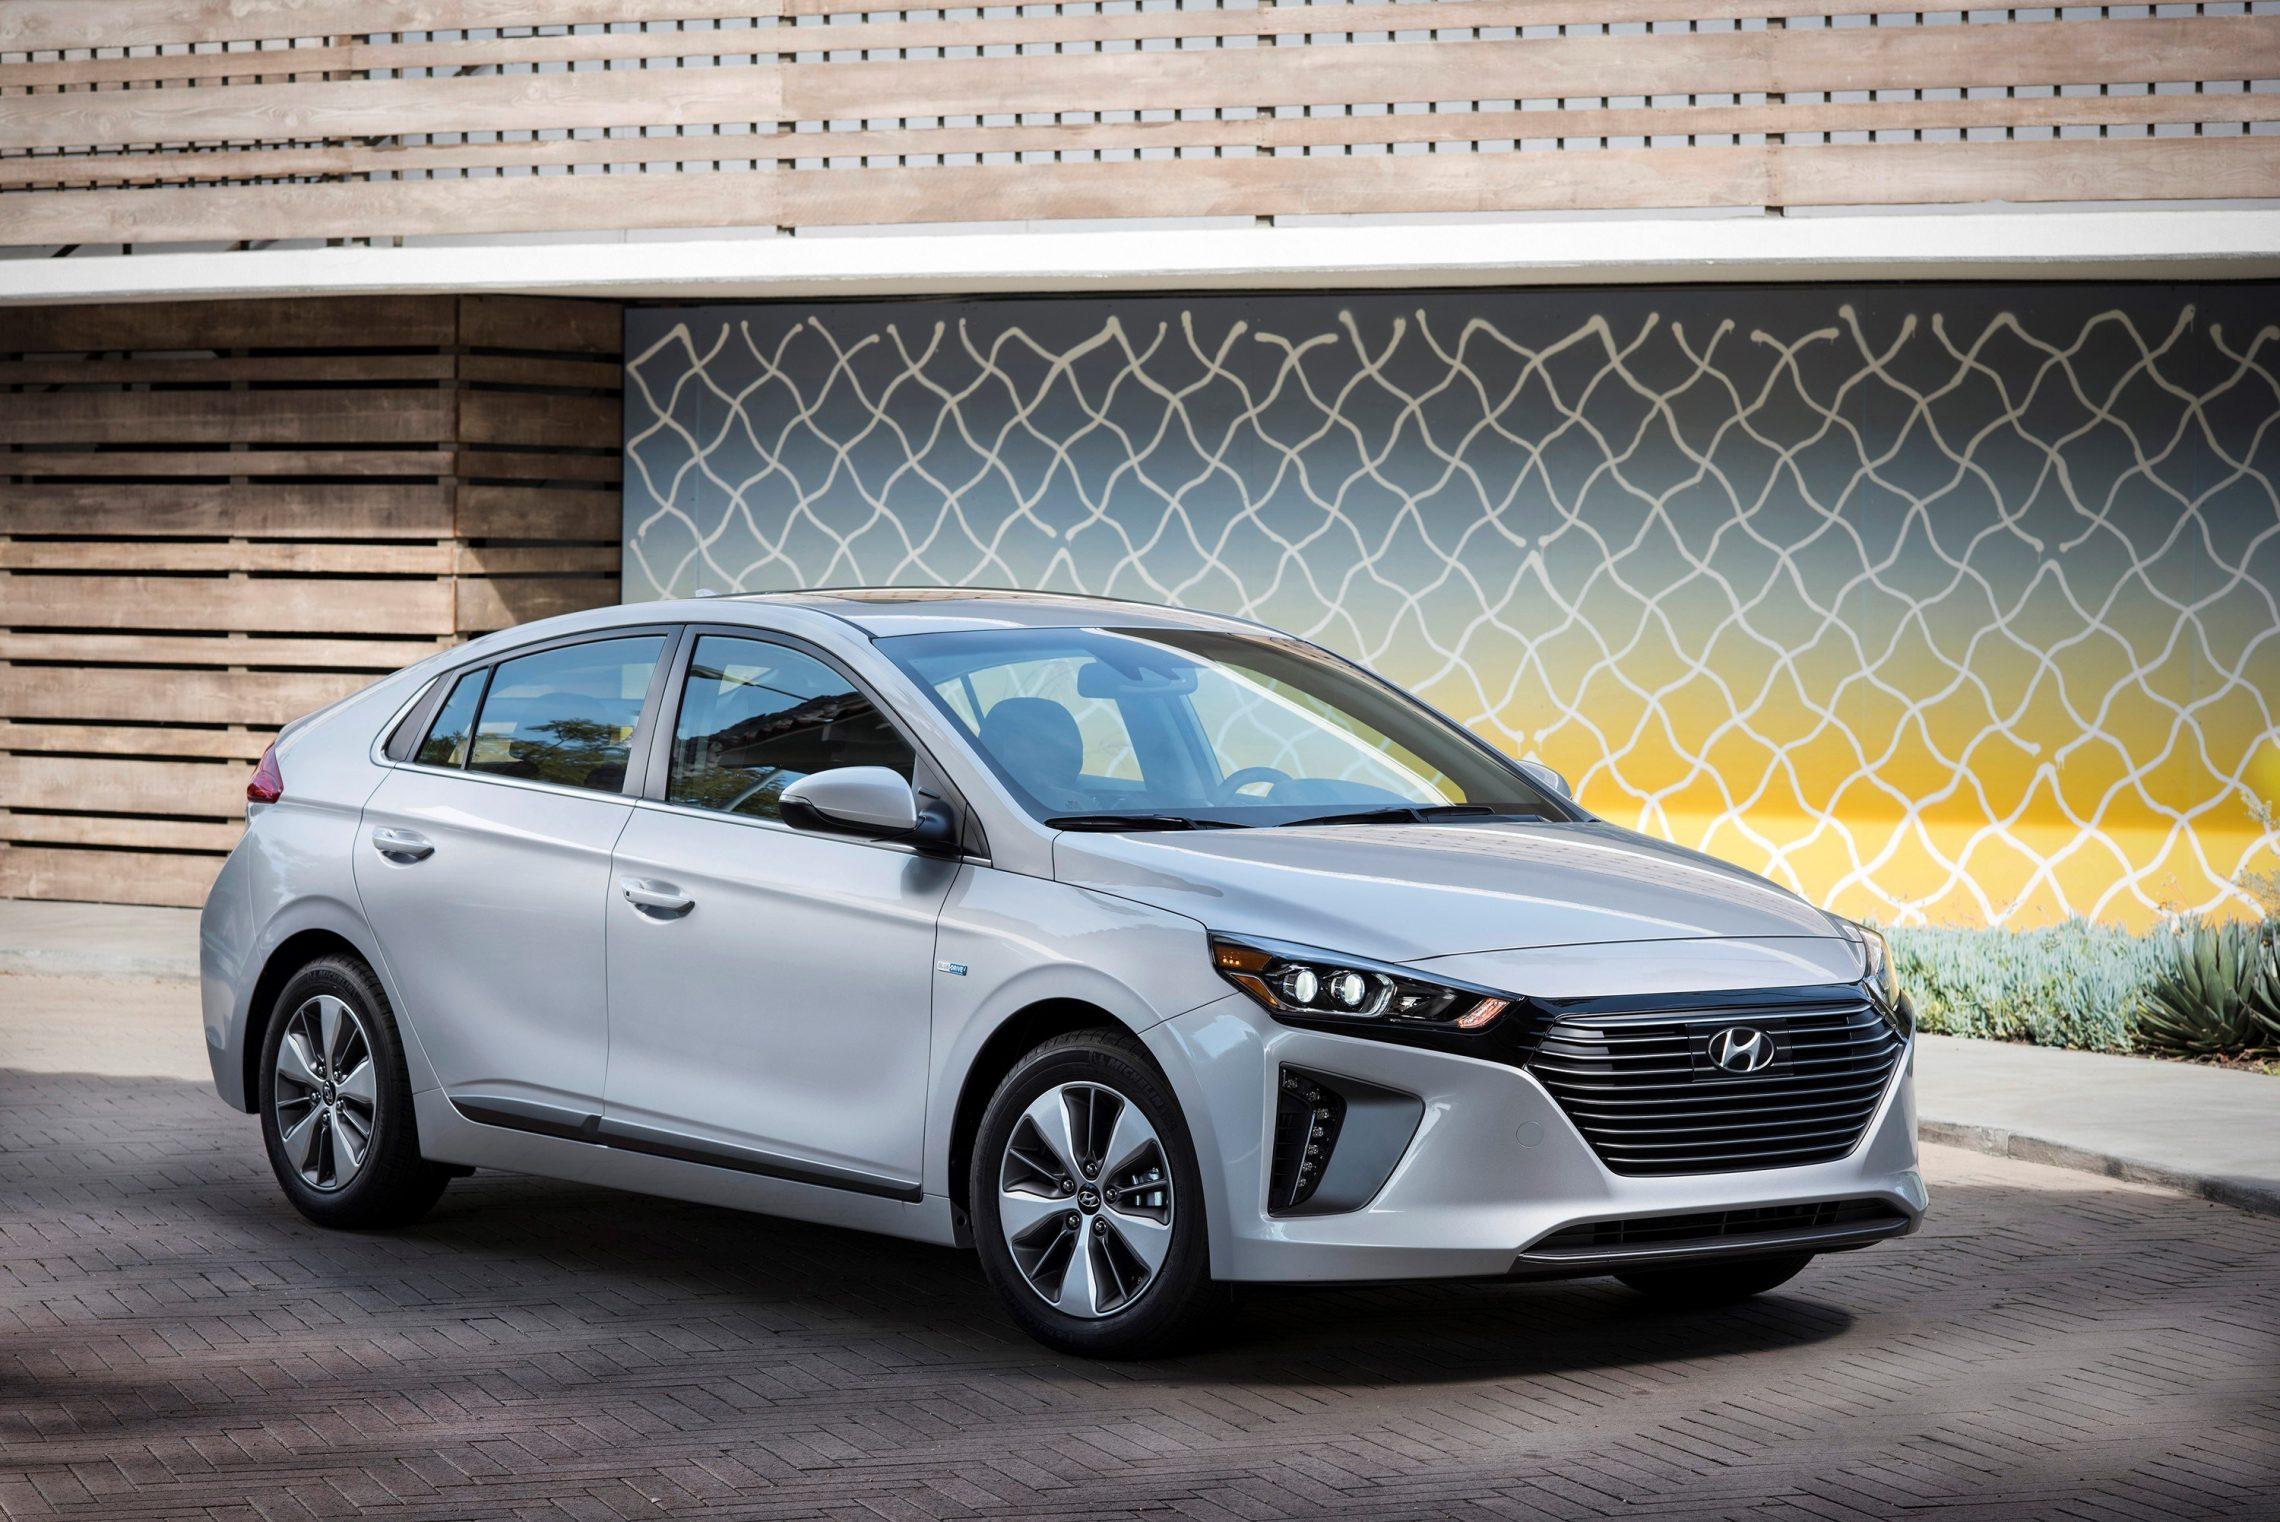 2018 Hyundai IONIQ Exterior